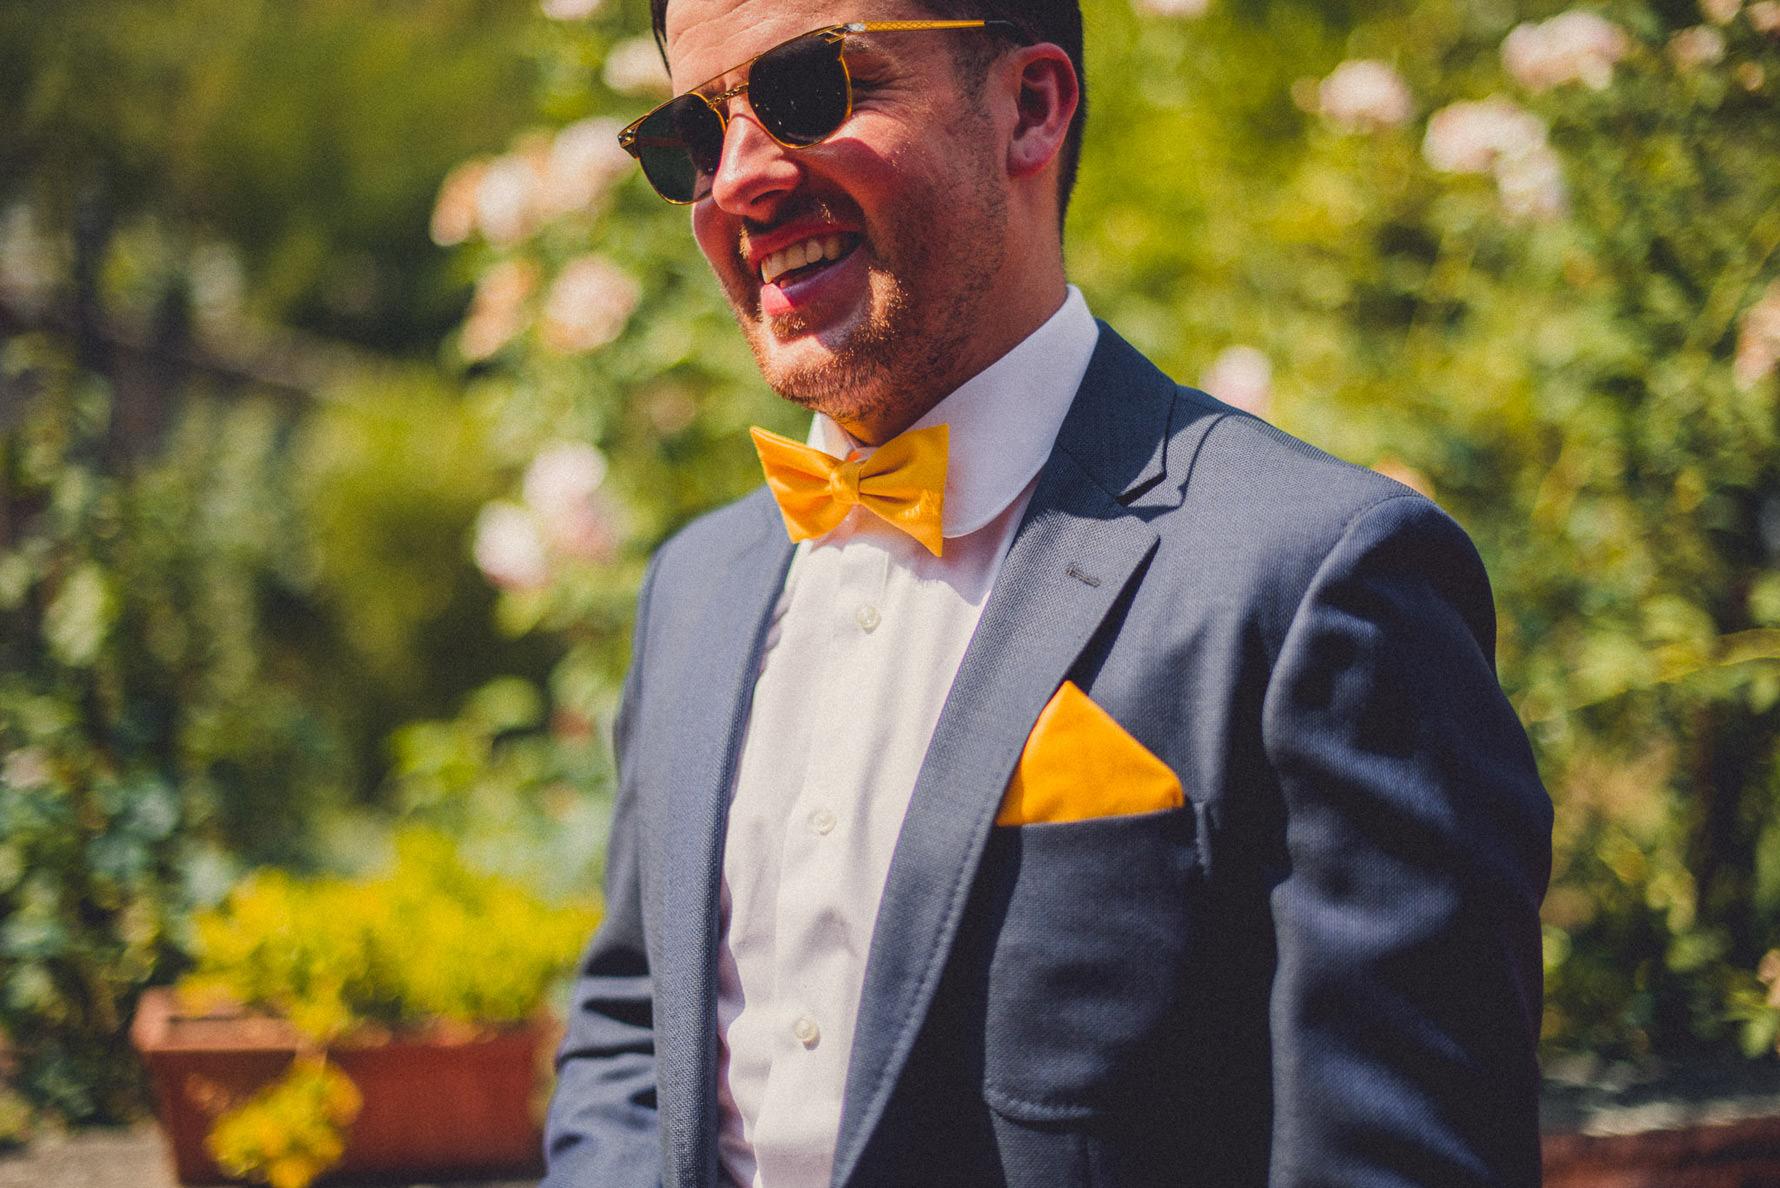 groom-portrait-during-wedding-day